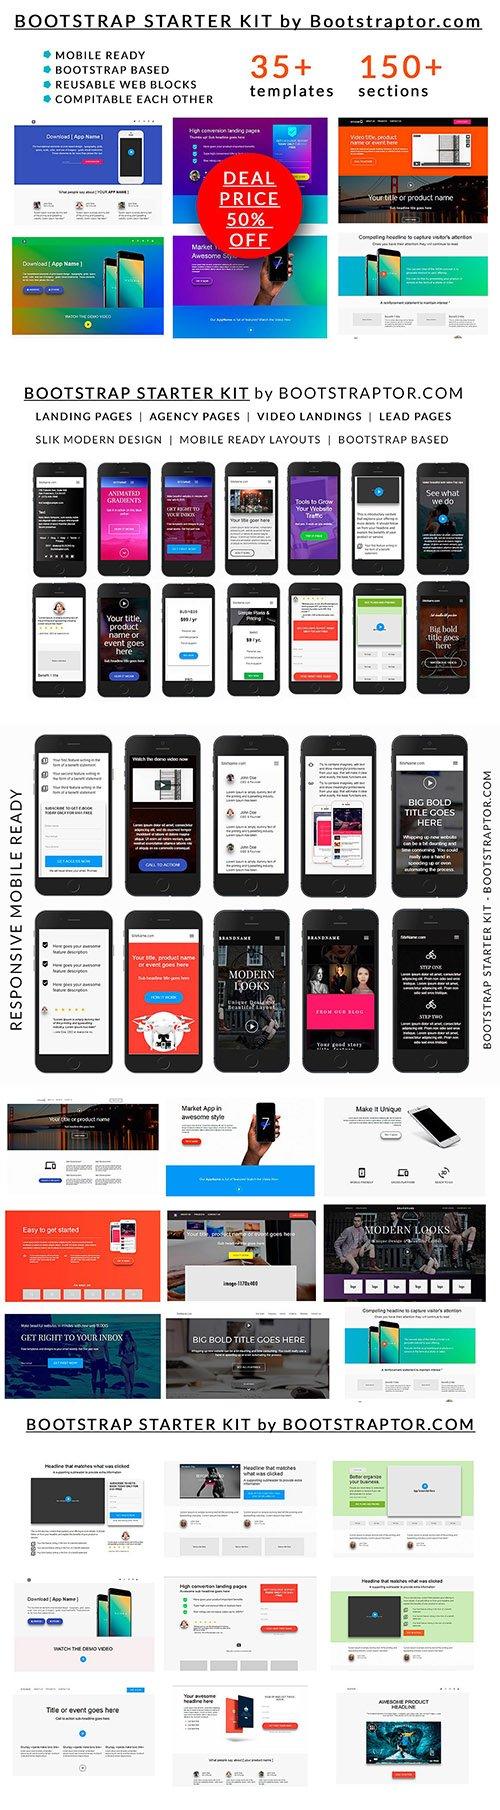 bootstrap starter kit 35 templates cm 1397241 nitrogfx download unique graphics for. Black Bedroom Furniture Sets. Home Design Ideas